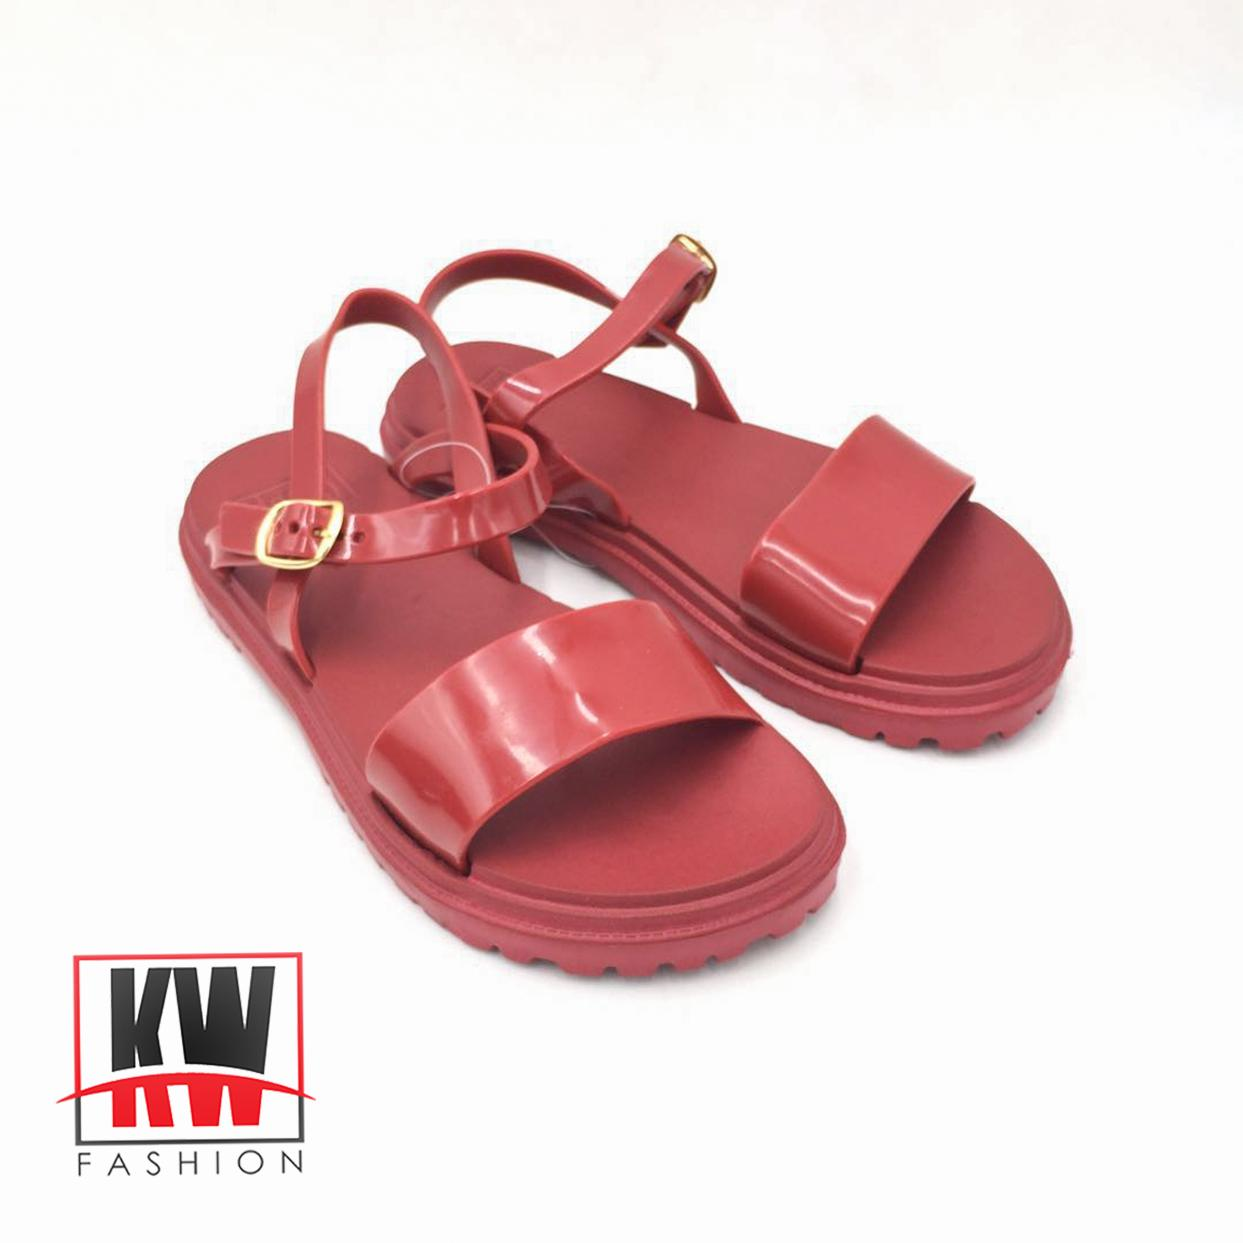 472c2f3d1bf6 Flip Flops for Women for sale - Womens Flip Flops online brands ...